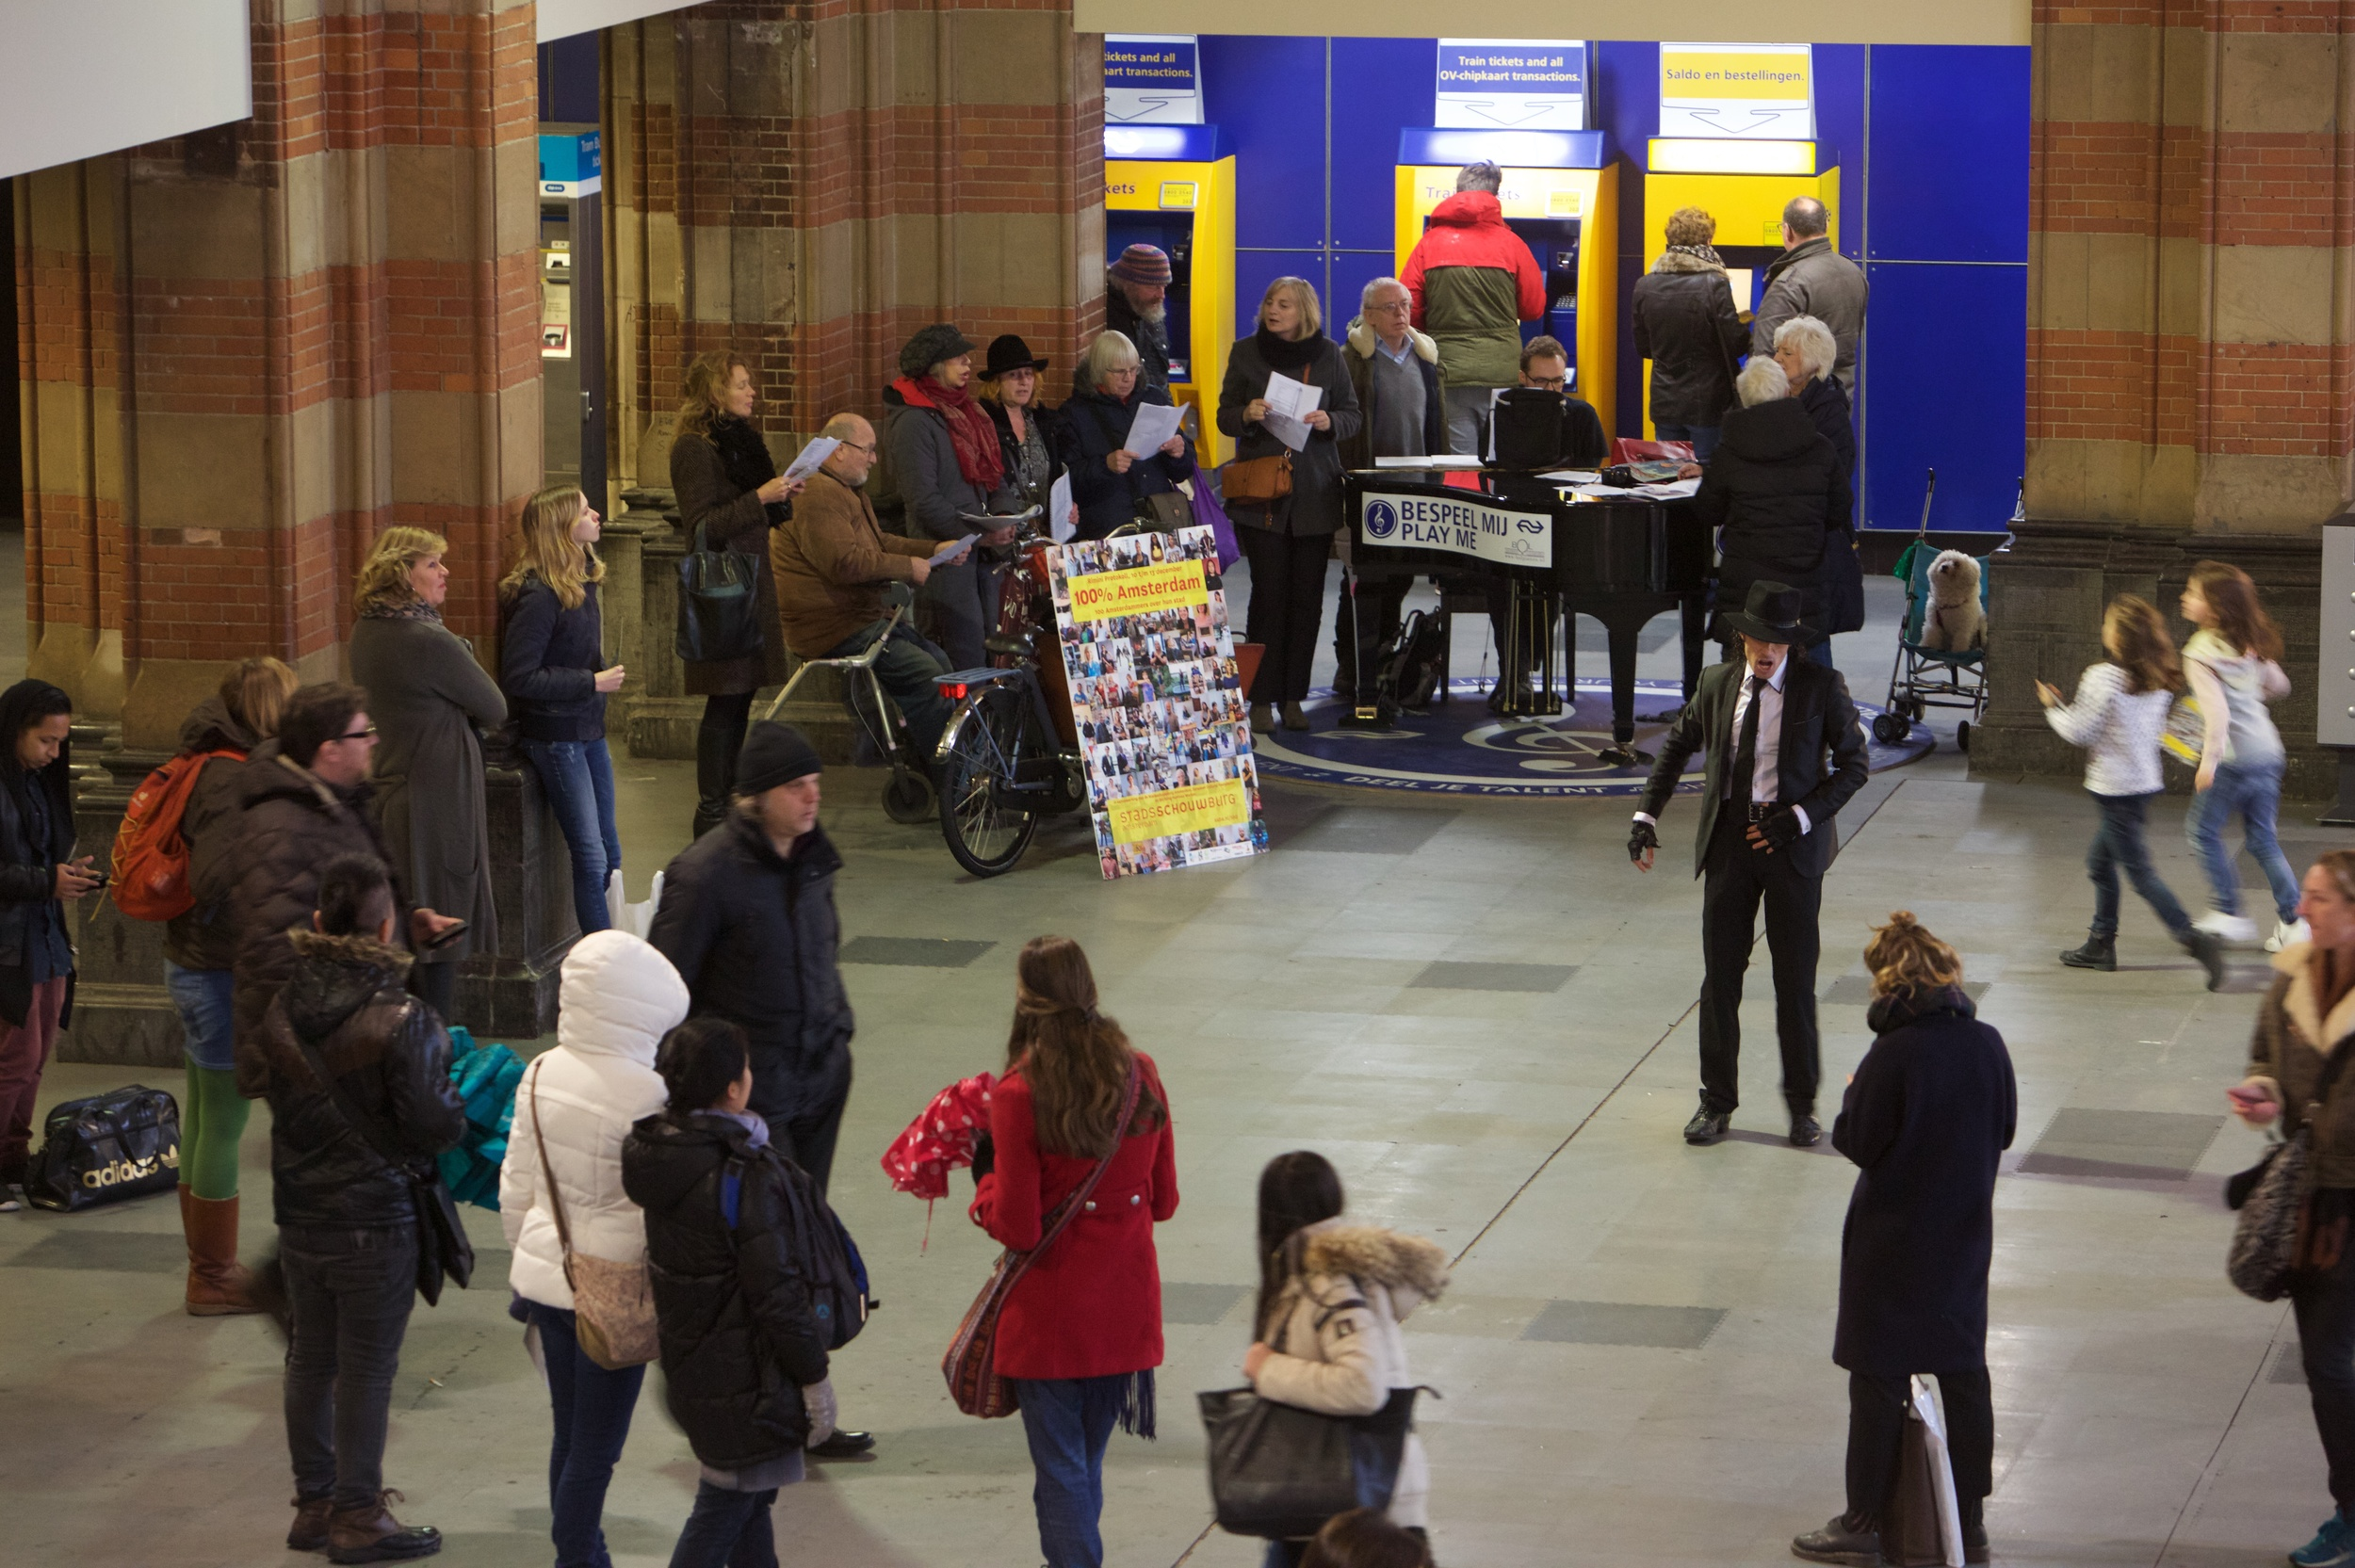 100% Amsterdam participants on 8 December at Amsterdam Central station. Photo ©Ernst van Deursen